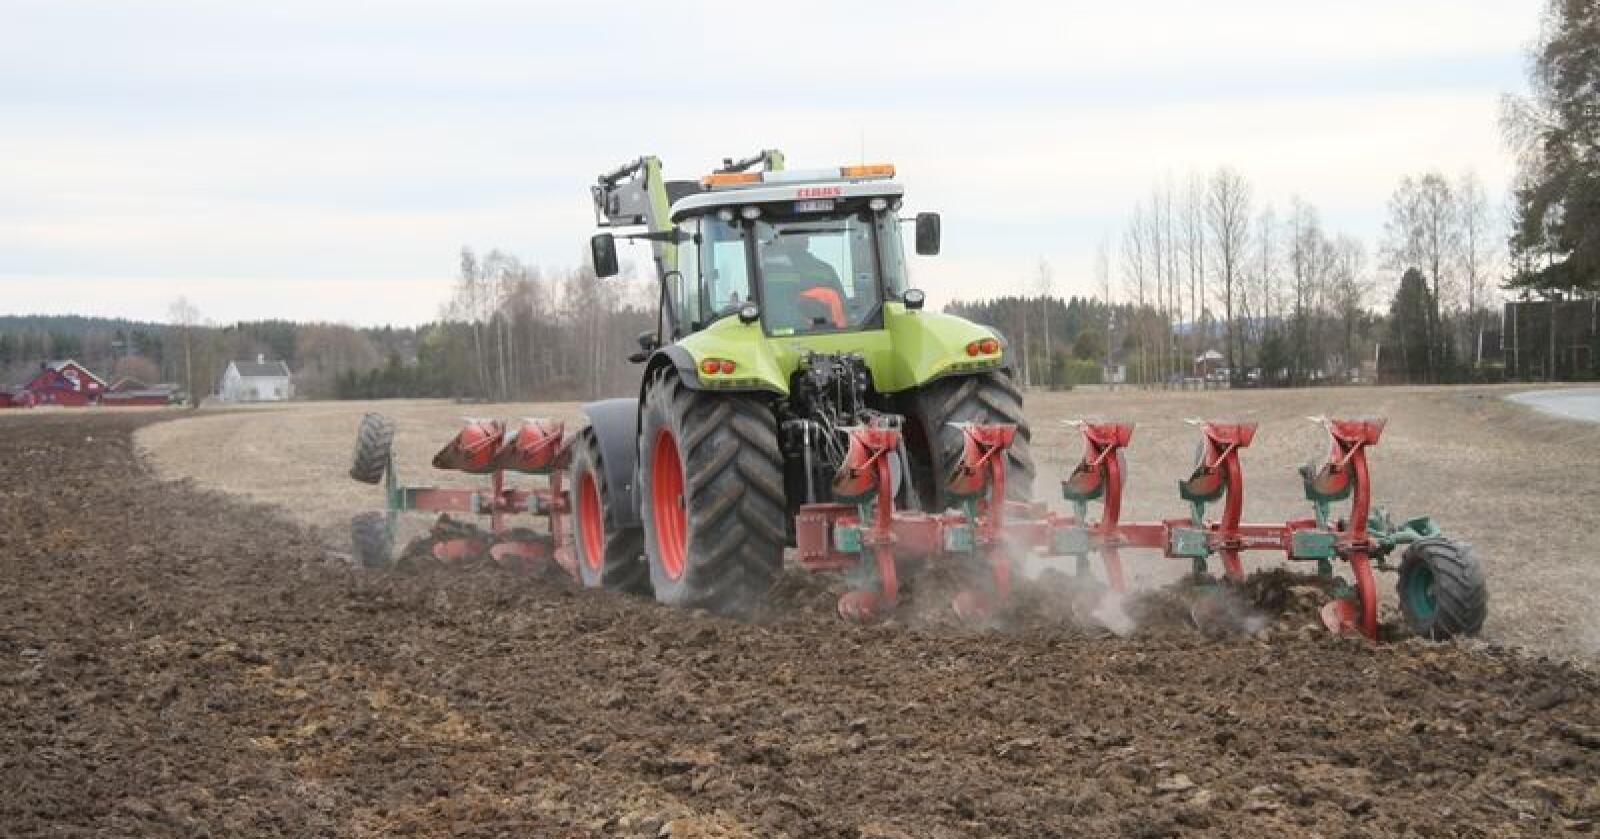 Kina kan bli ein stor marknad for Kverneland. Foto: Espen Syljuåsen